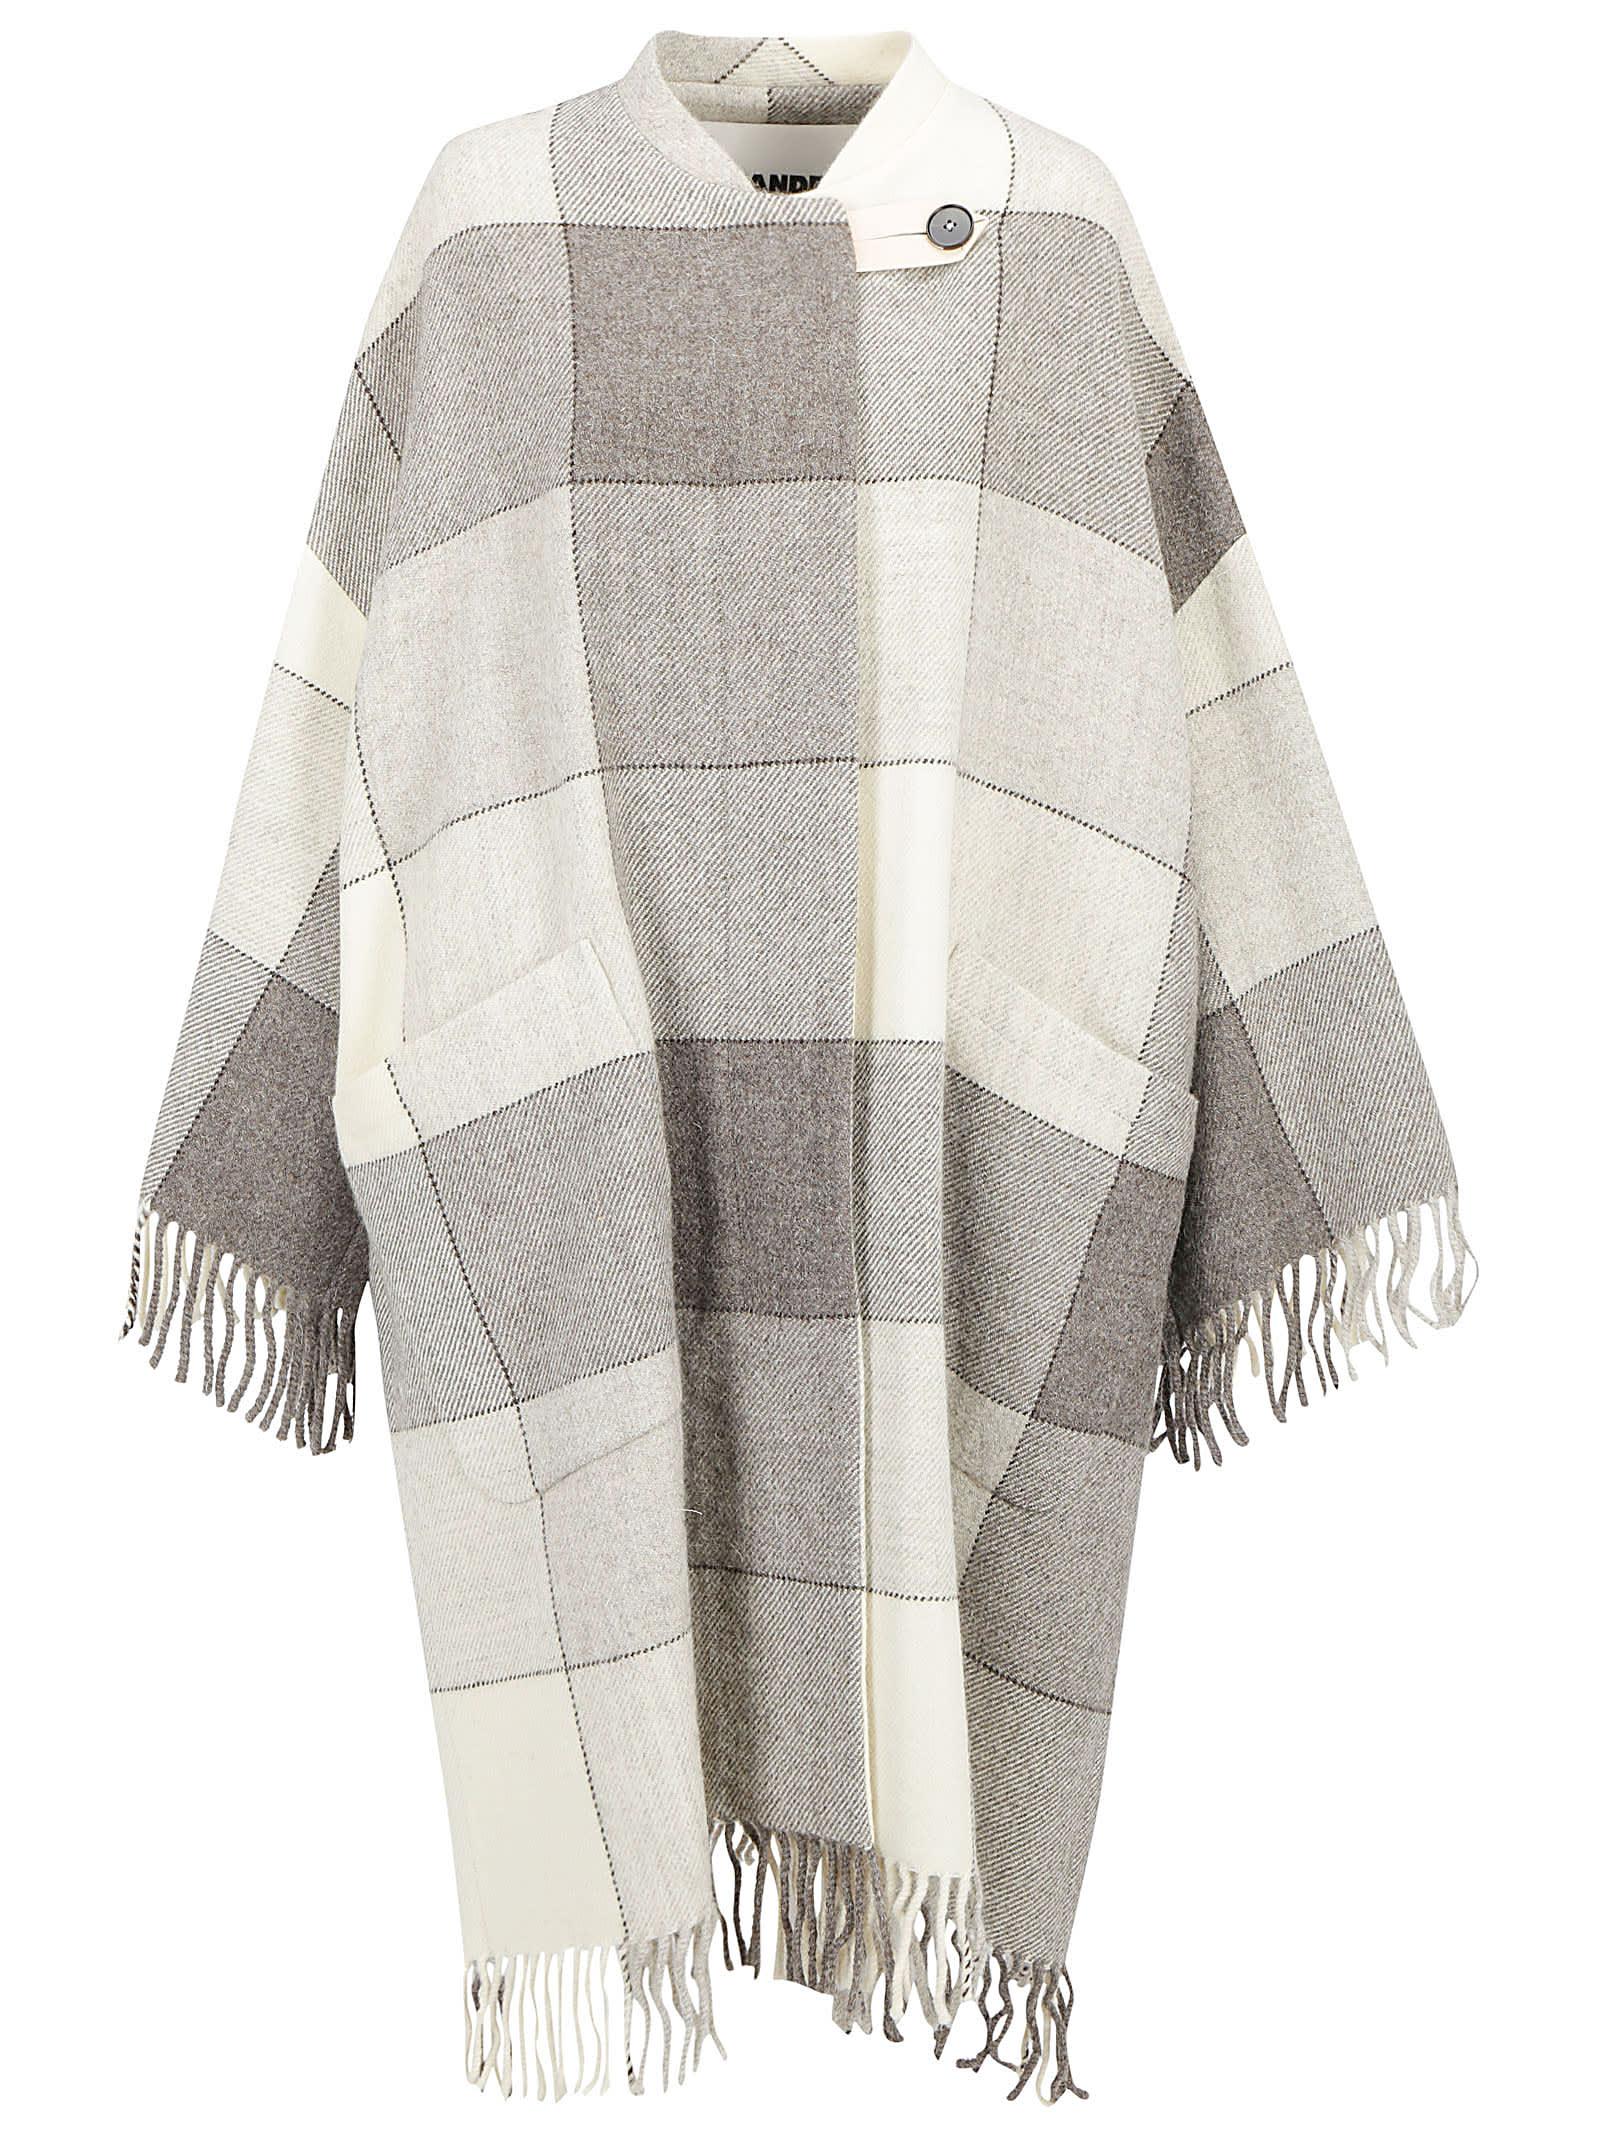 Jil Sander Luella Blanket Coat